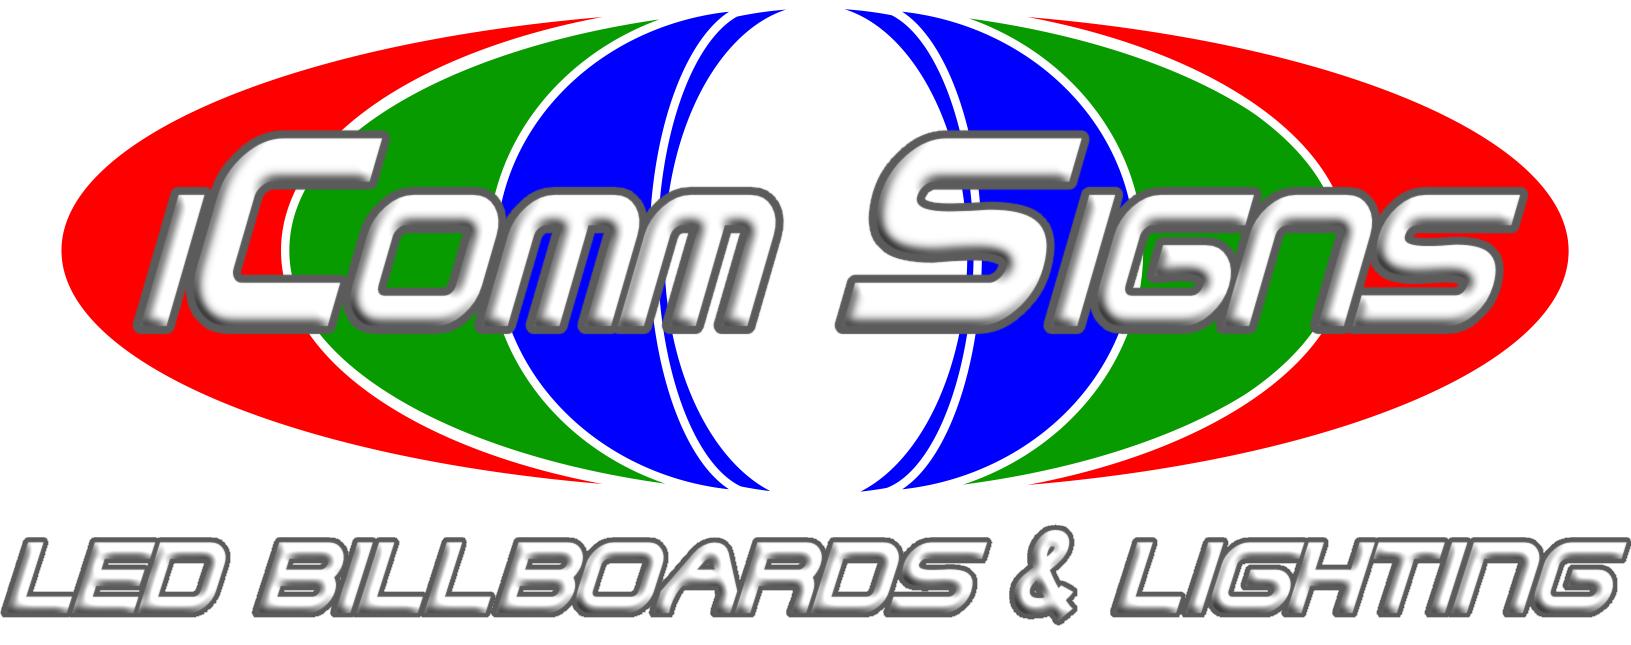 iComm Signs